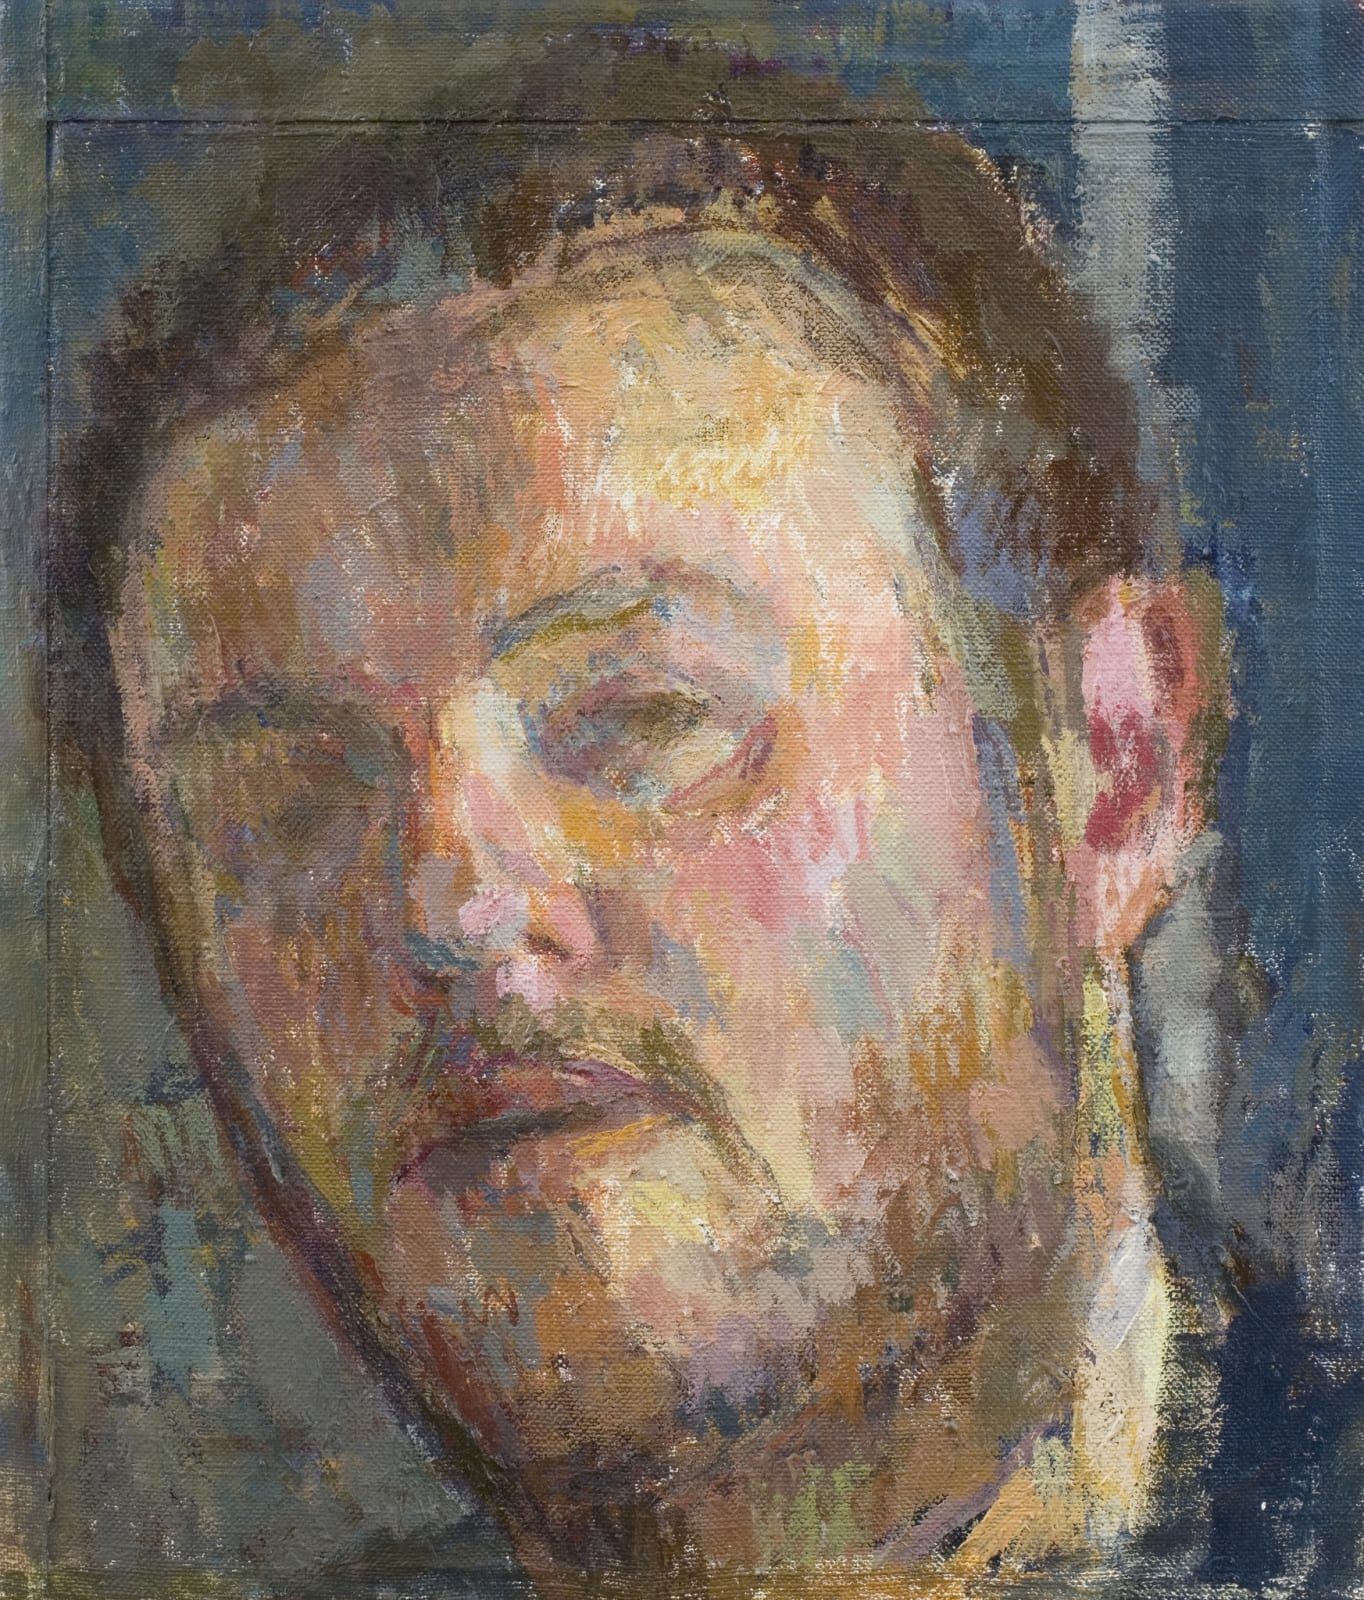 Daniel Shadbolt, Self-Portrait, 2009